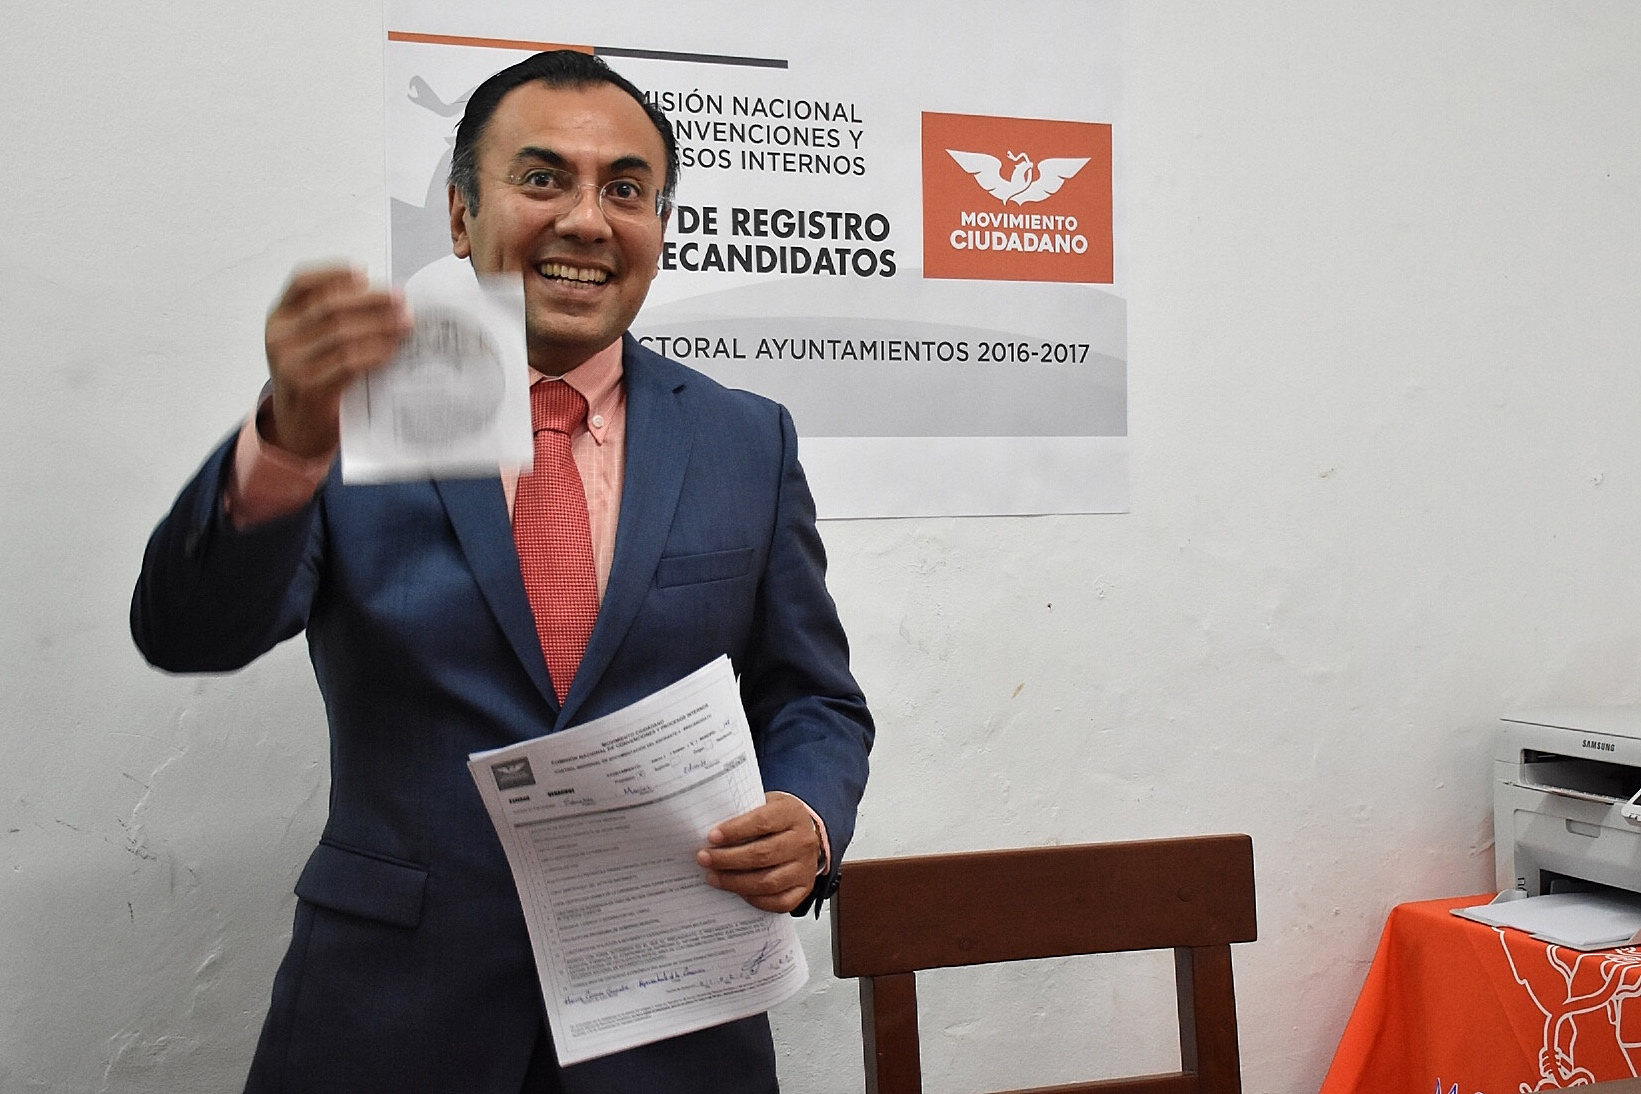 Denuncian a candidato de PVEM por golpear a su asesor de campaña